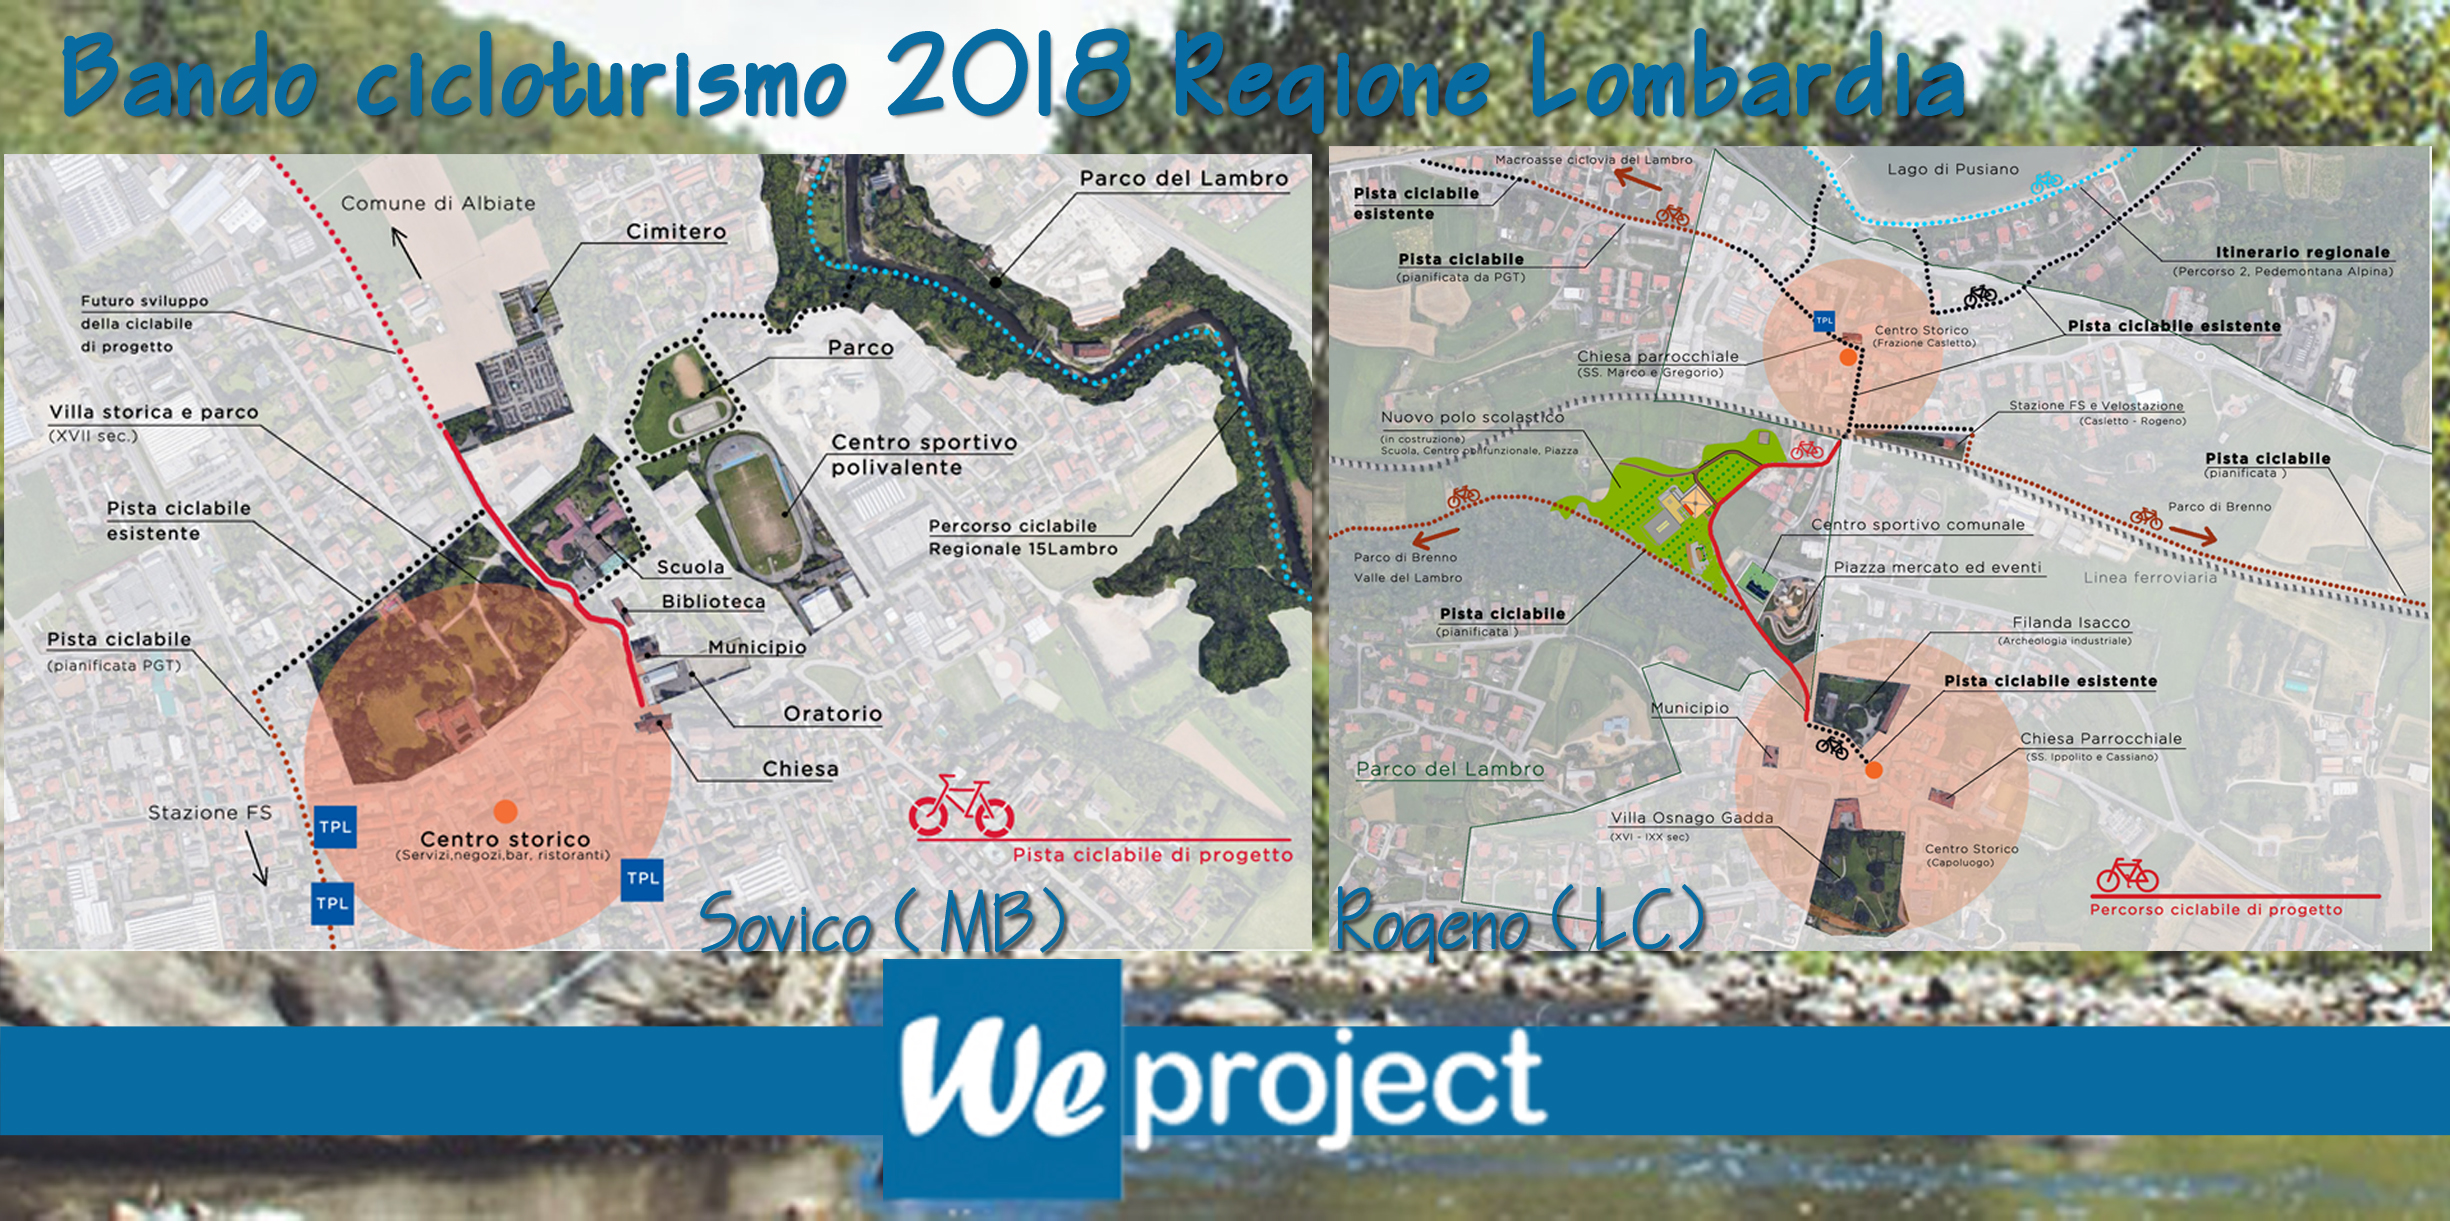 cicloturismo Lombardia 2018